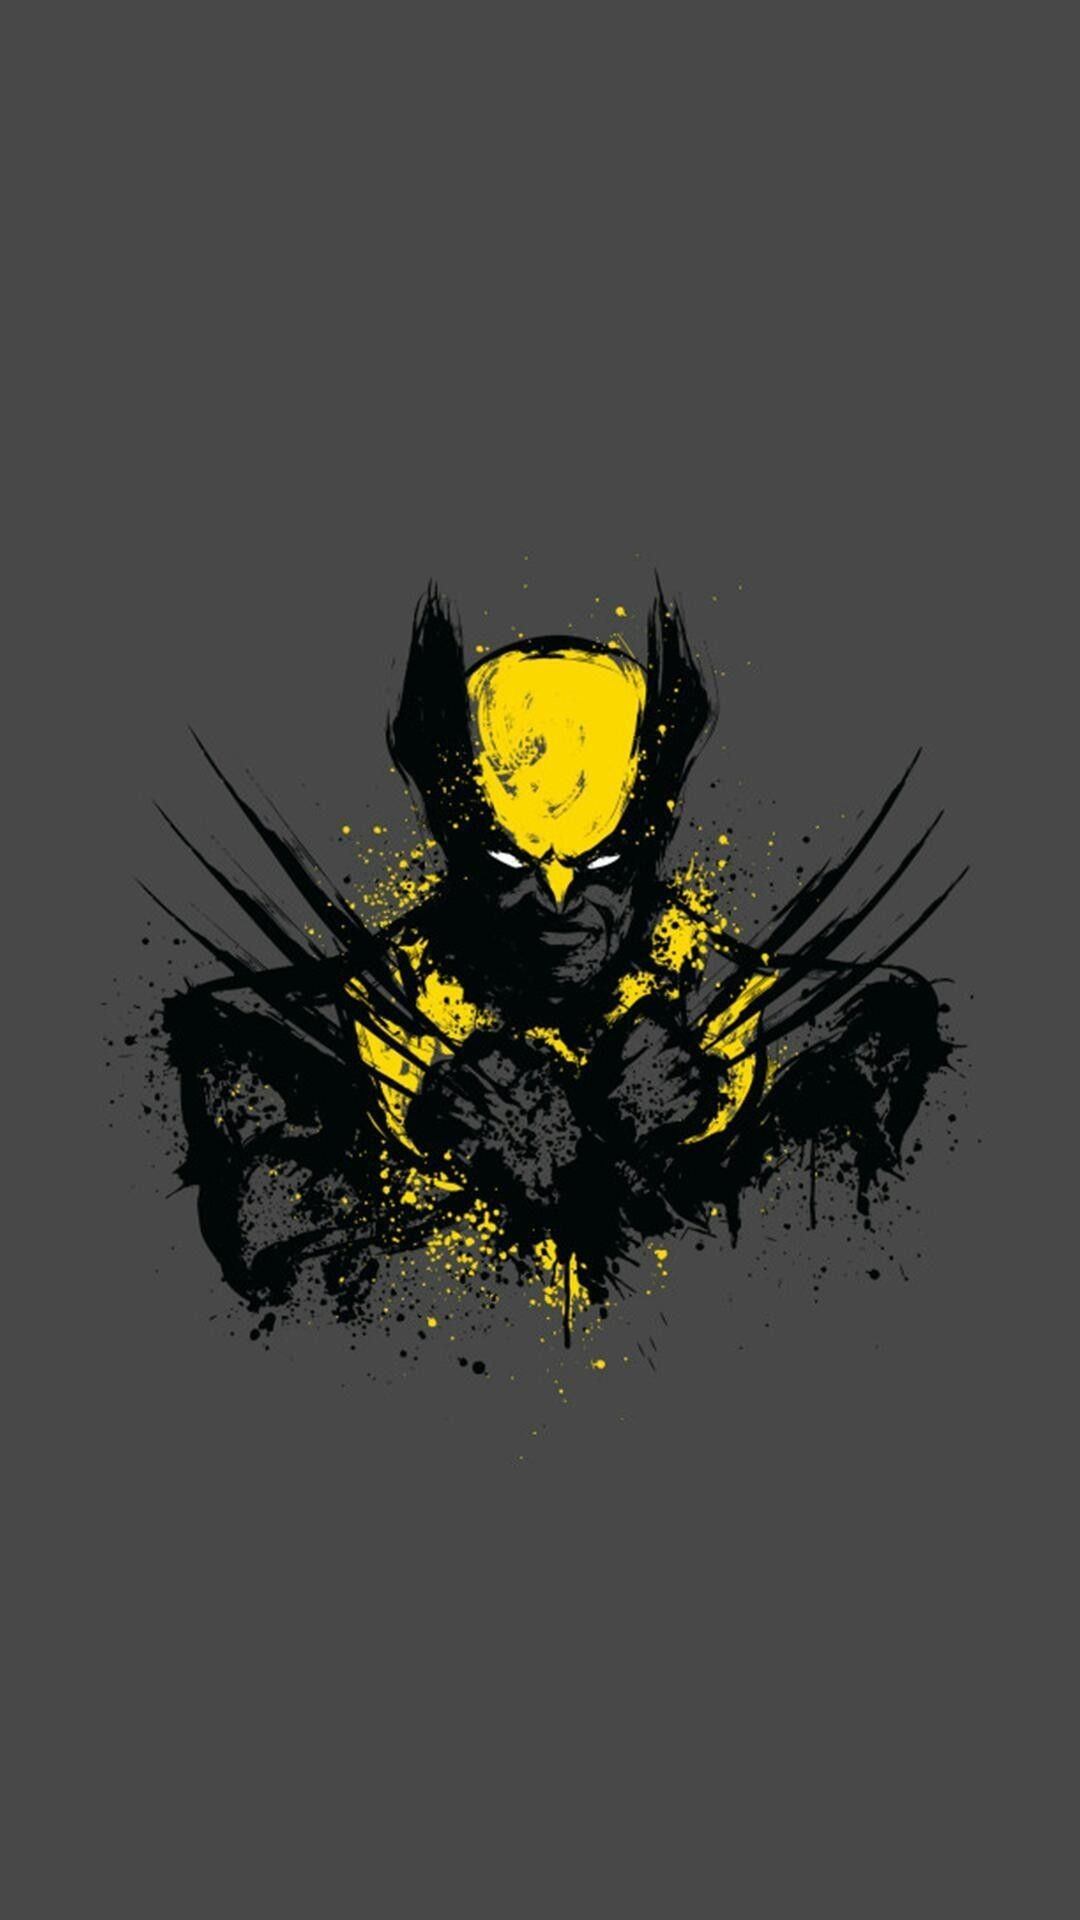 Res: 1080x1920, Wolverine wallpaper